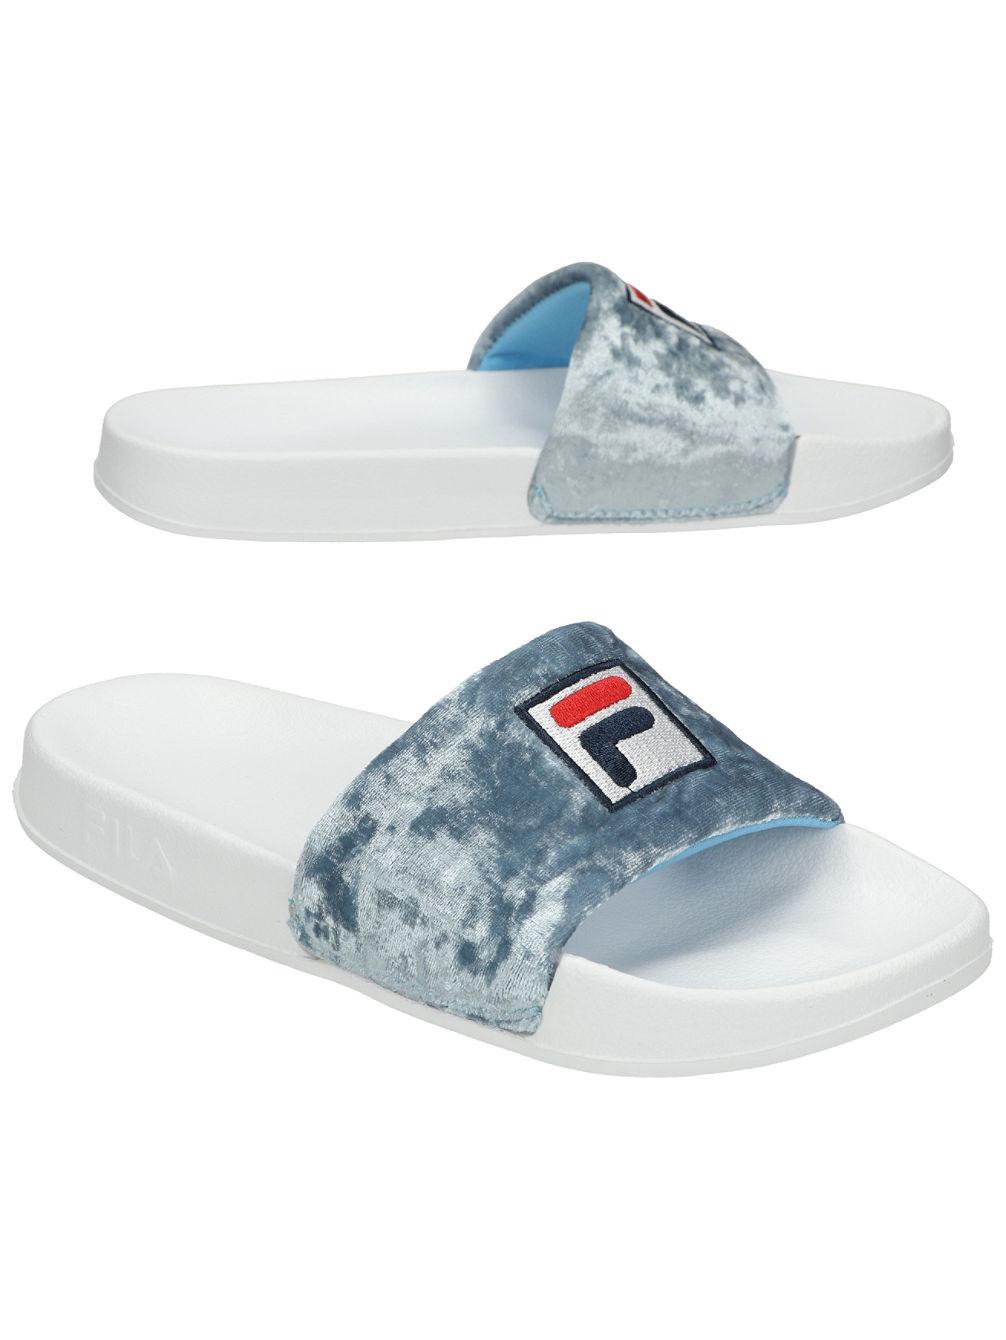 a65e0e54f5c5 Fila Palm Beach Sandals · Fila Women Innovation Baywood Sandal 145 - Sandals  - White